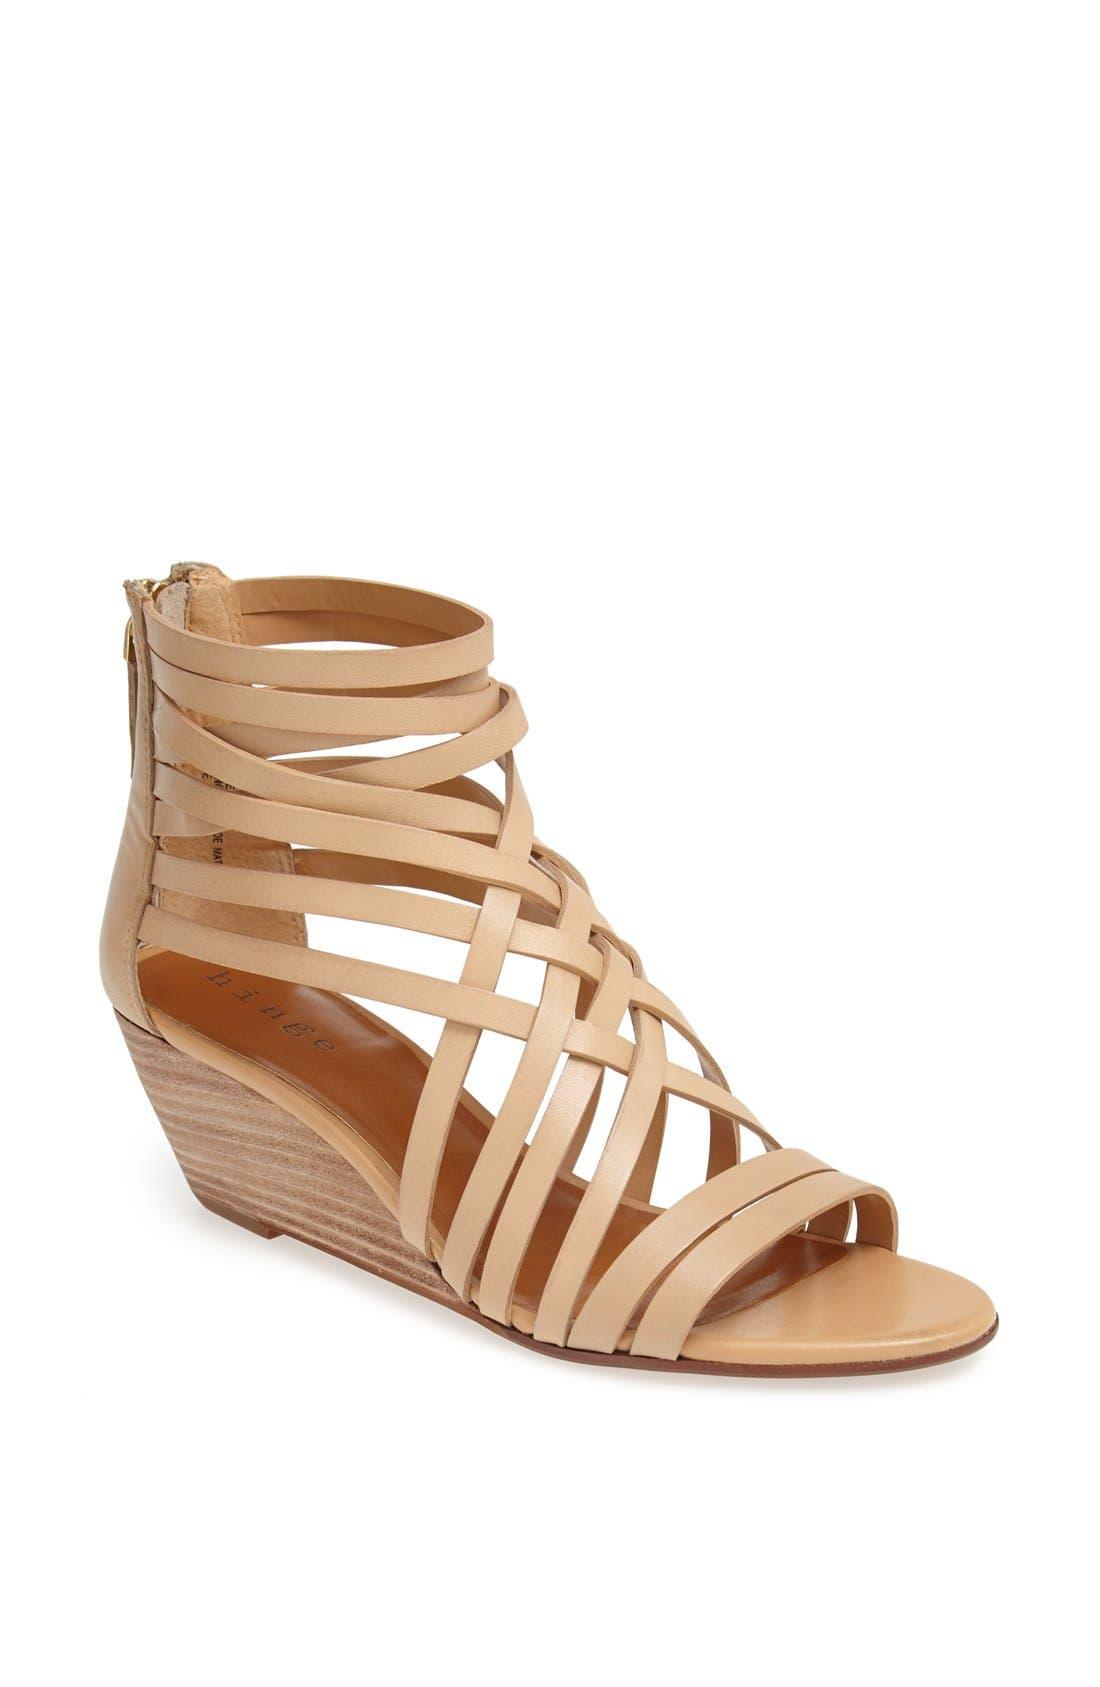 ,                             'Neta' Leather Wedge Sandal,                             Main thumbnail 17, color,                             252